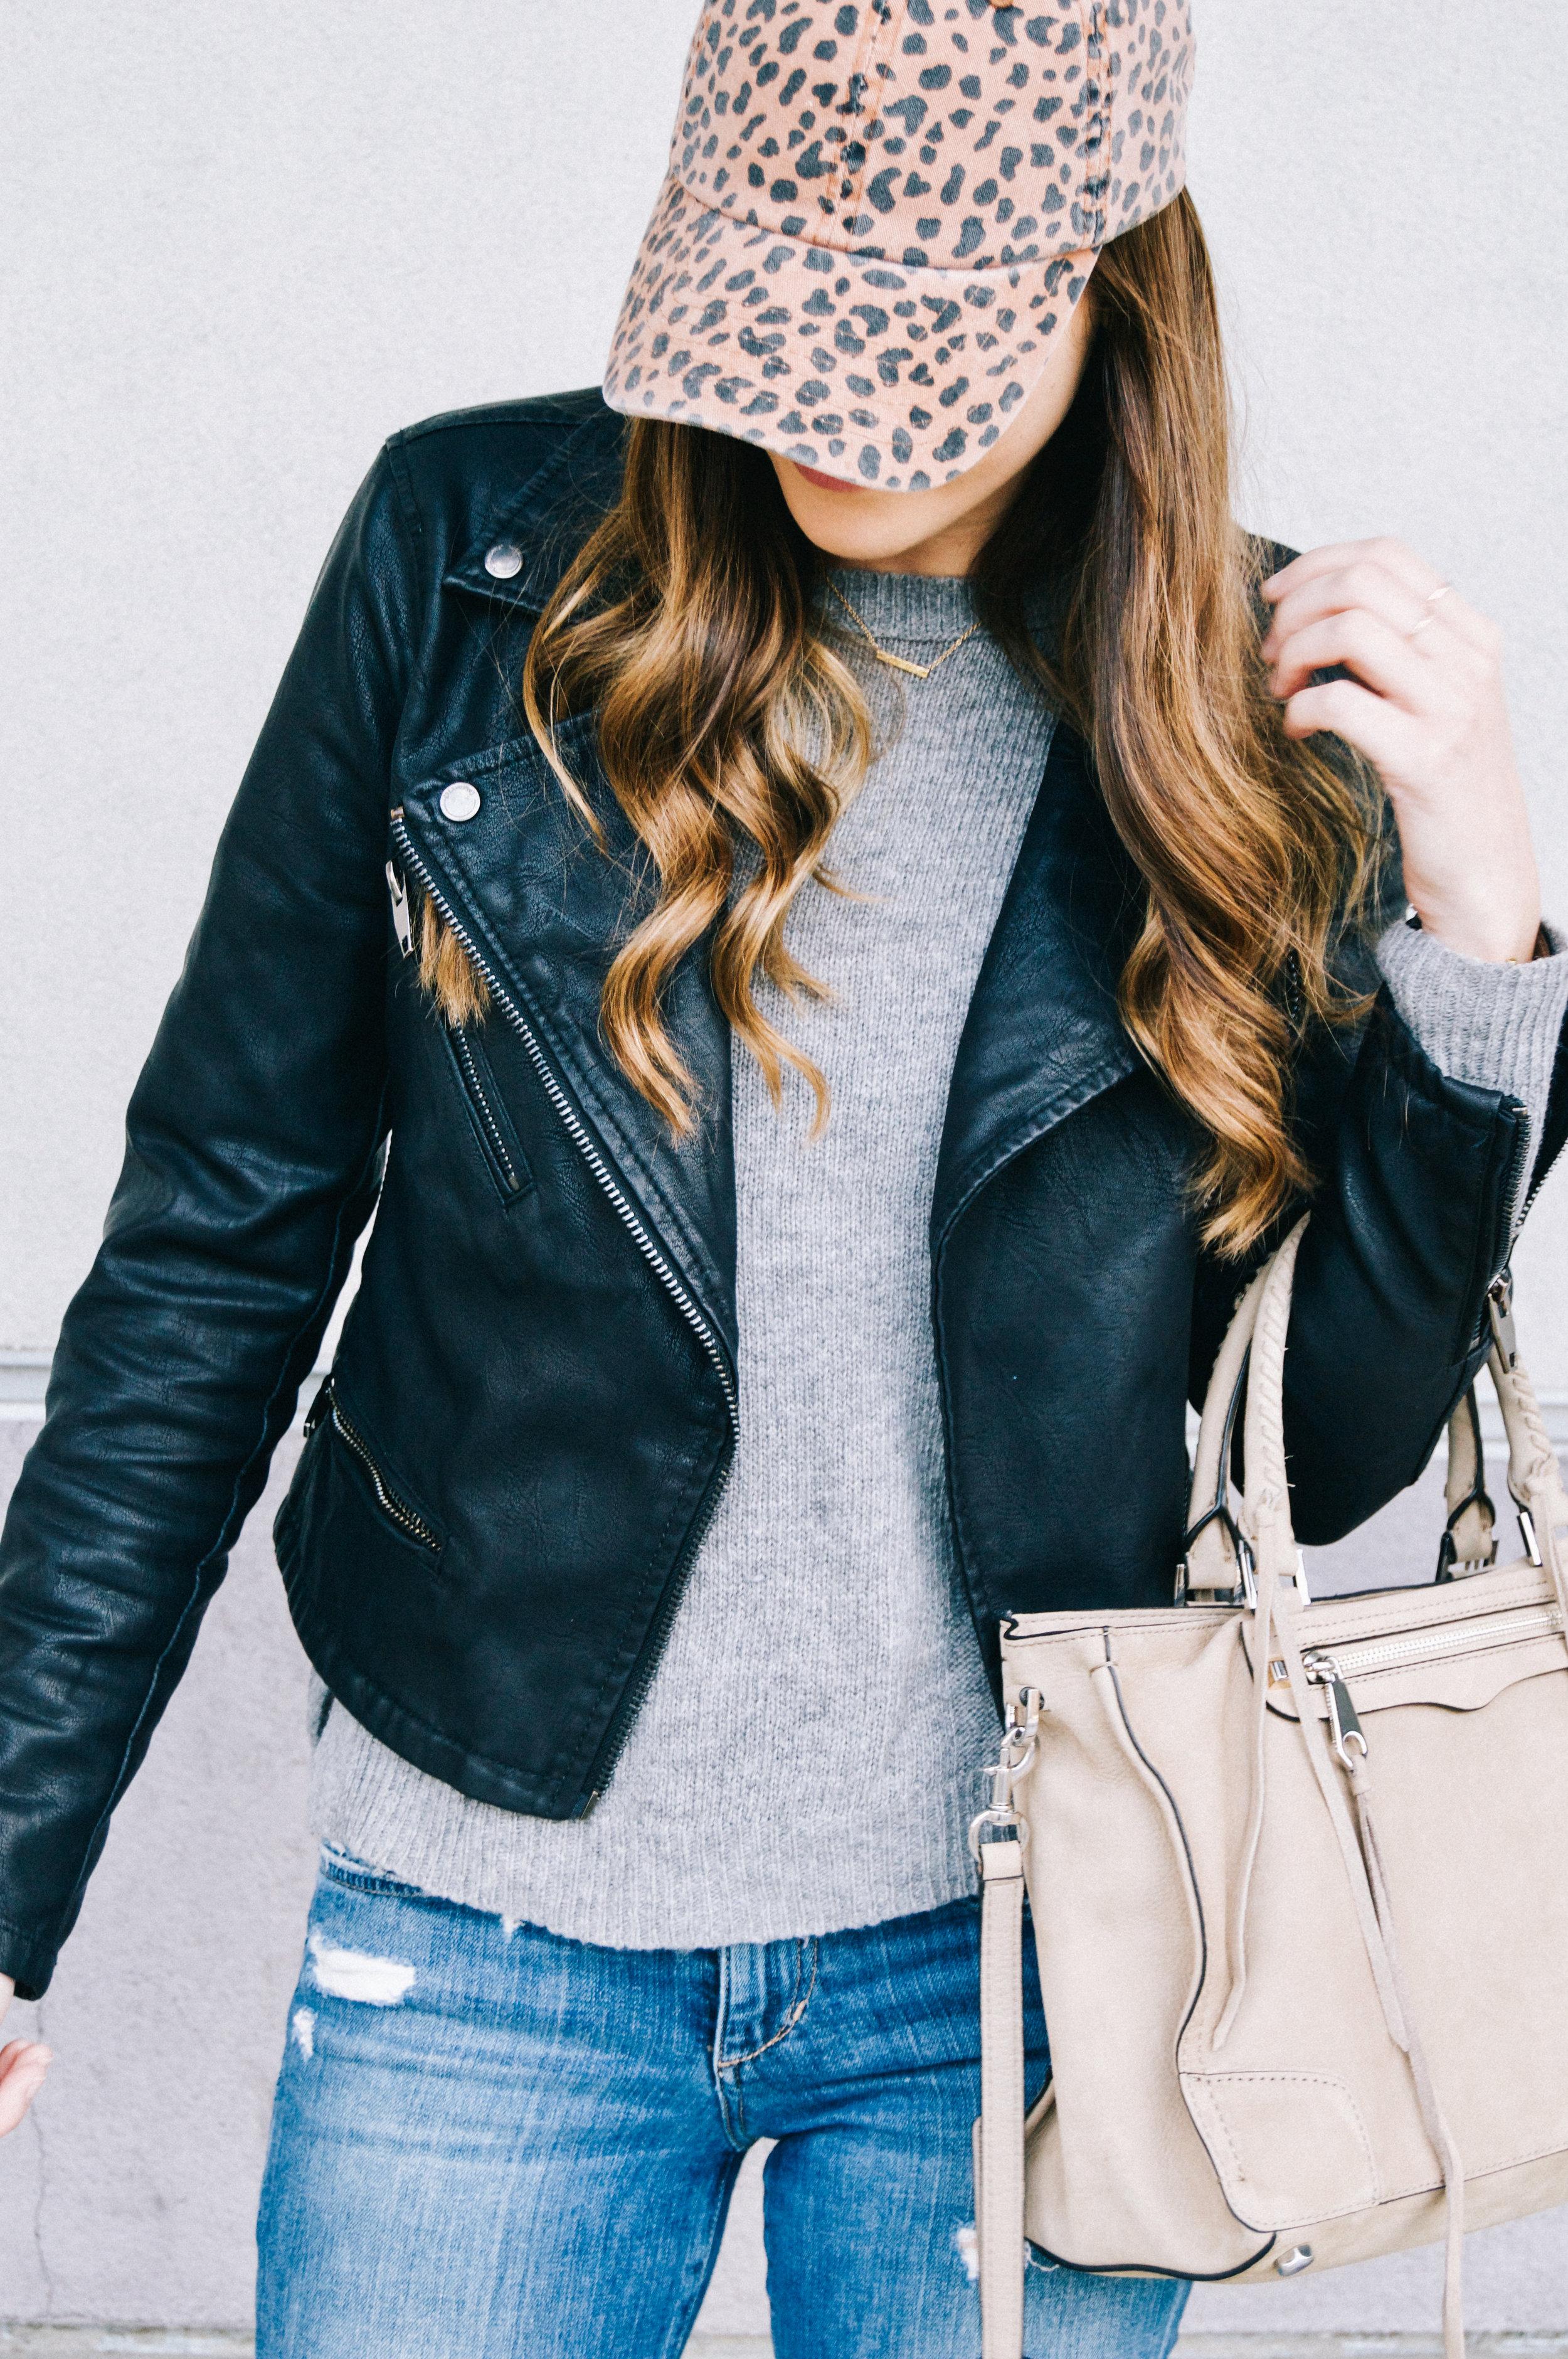 Shop the Look Below.  Stitch Fix sweater |  Joe's Jeans  |  BlankNYC Jacket  |  Rebecca Minkoff Bag |  Nike Sneakers  |  Urban Outfitters Hat  |  Gorjana necklace  c/o